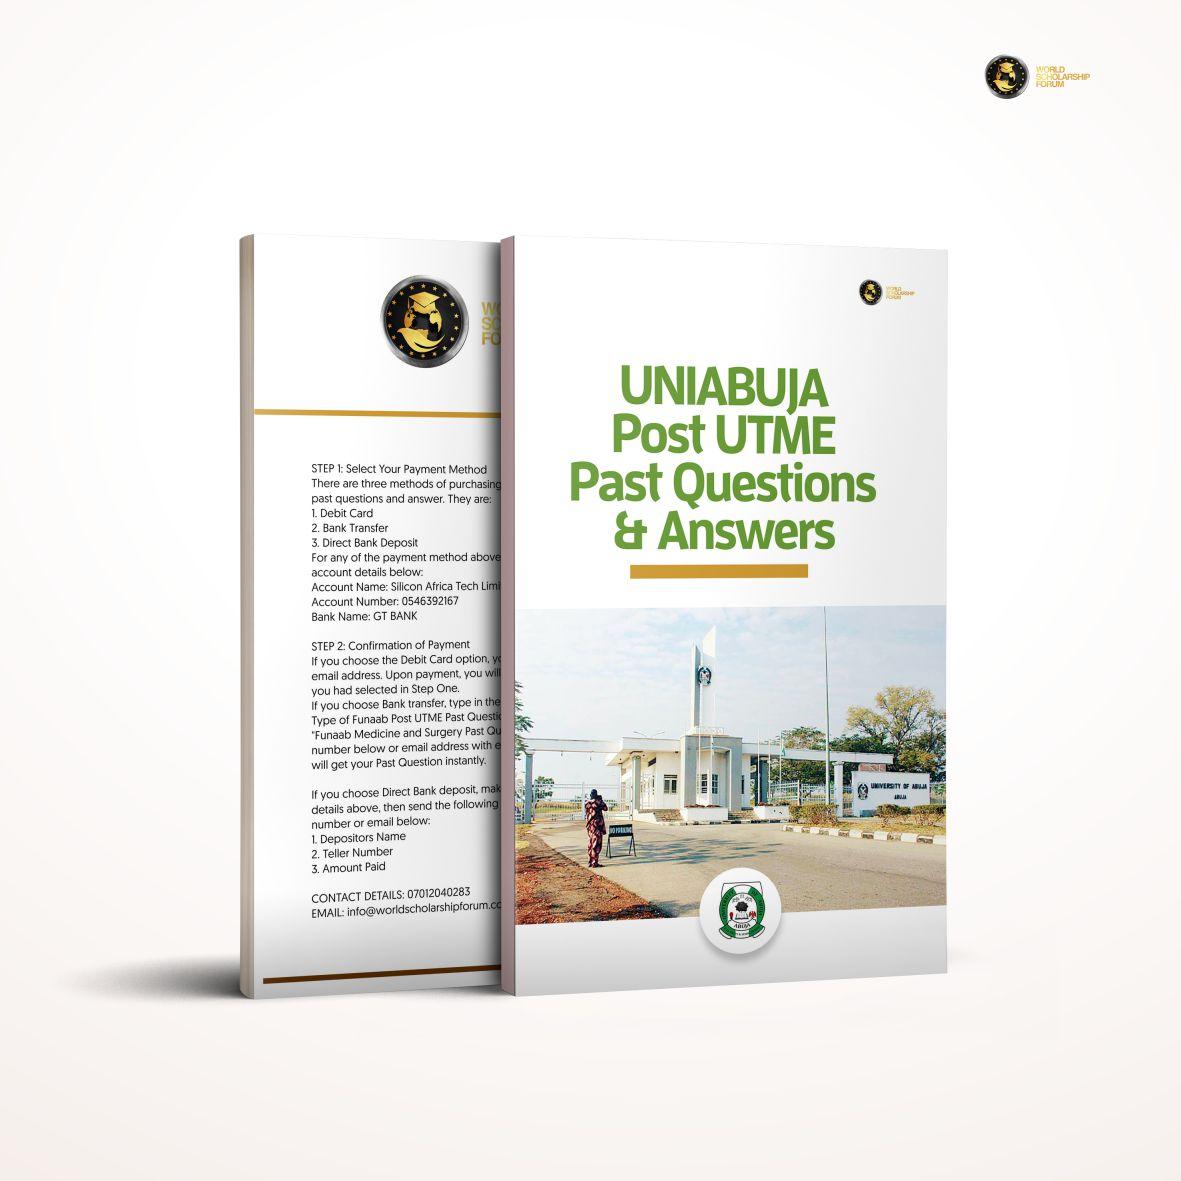 uniabuja-post-utme-past-question